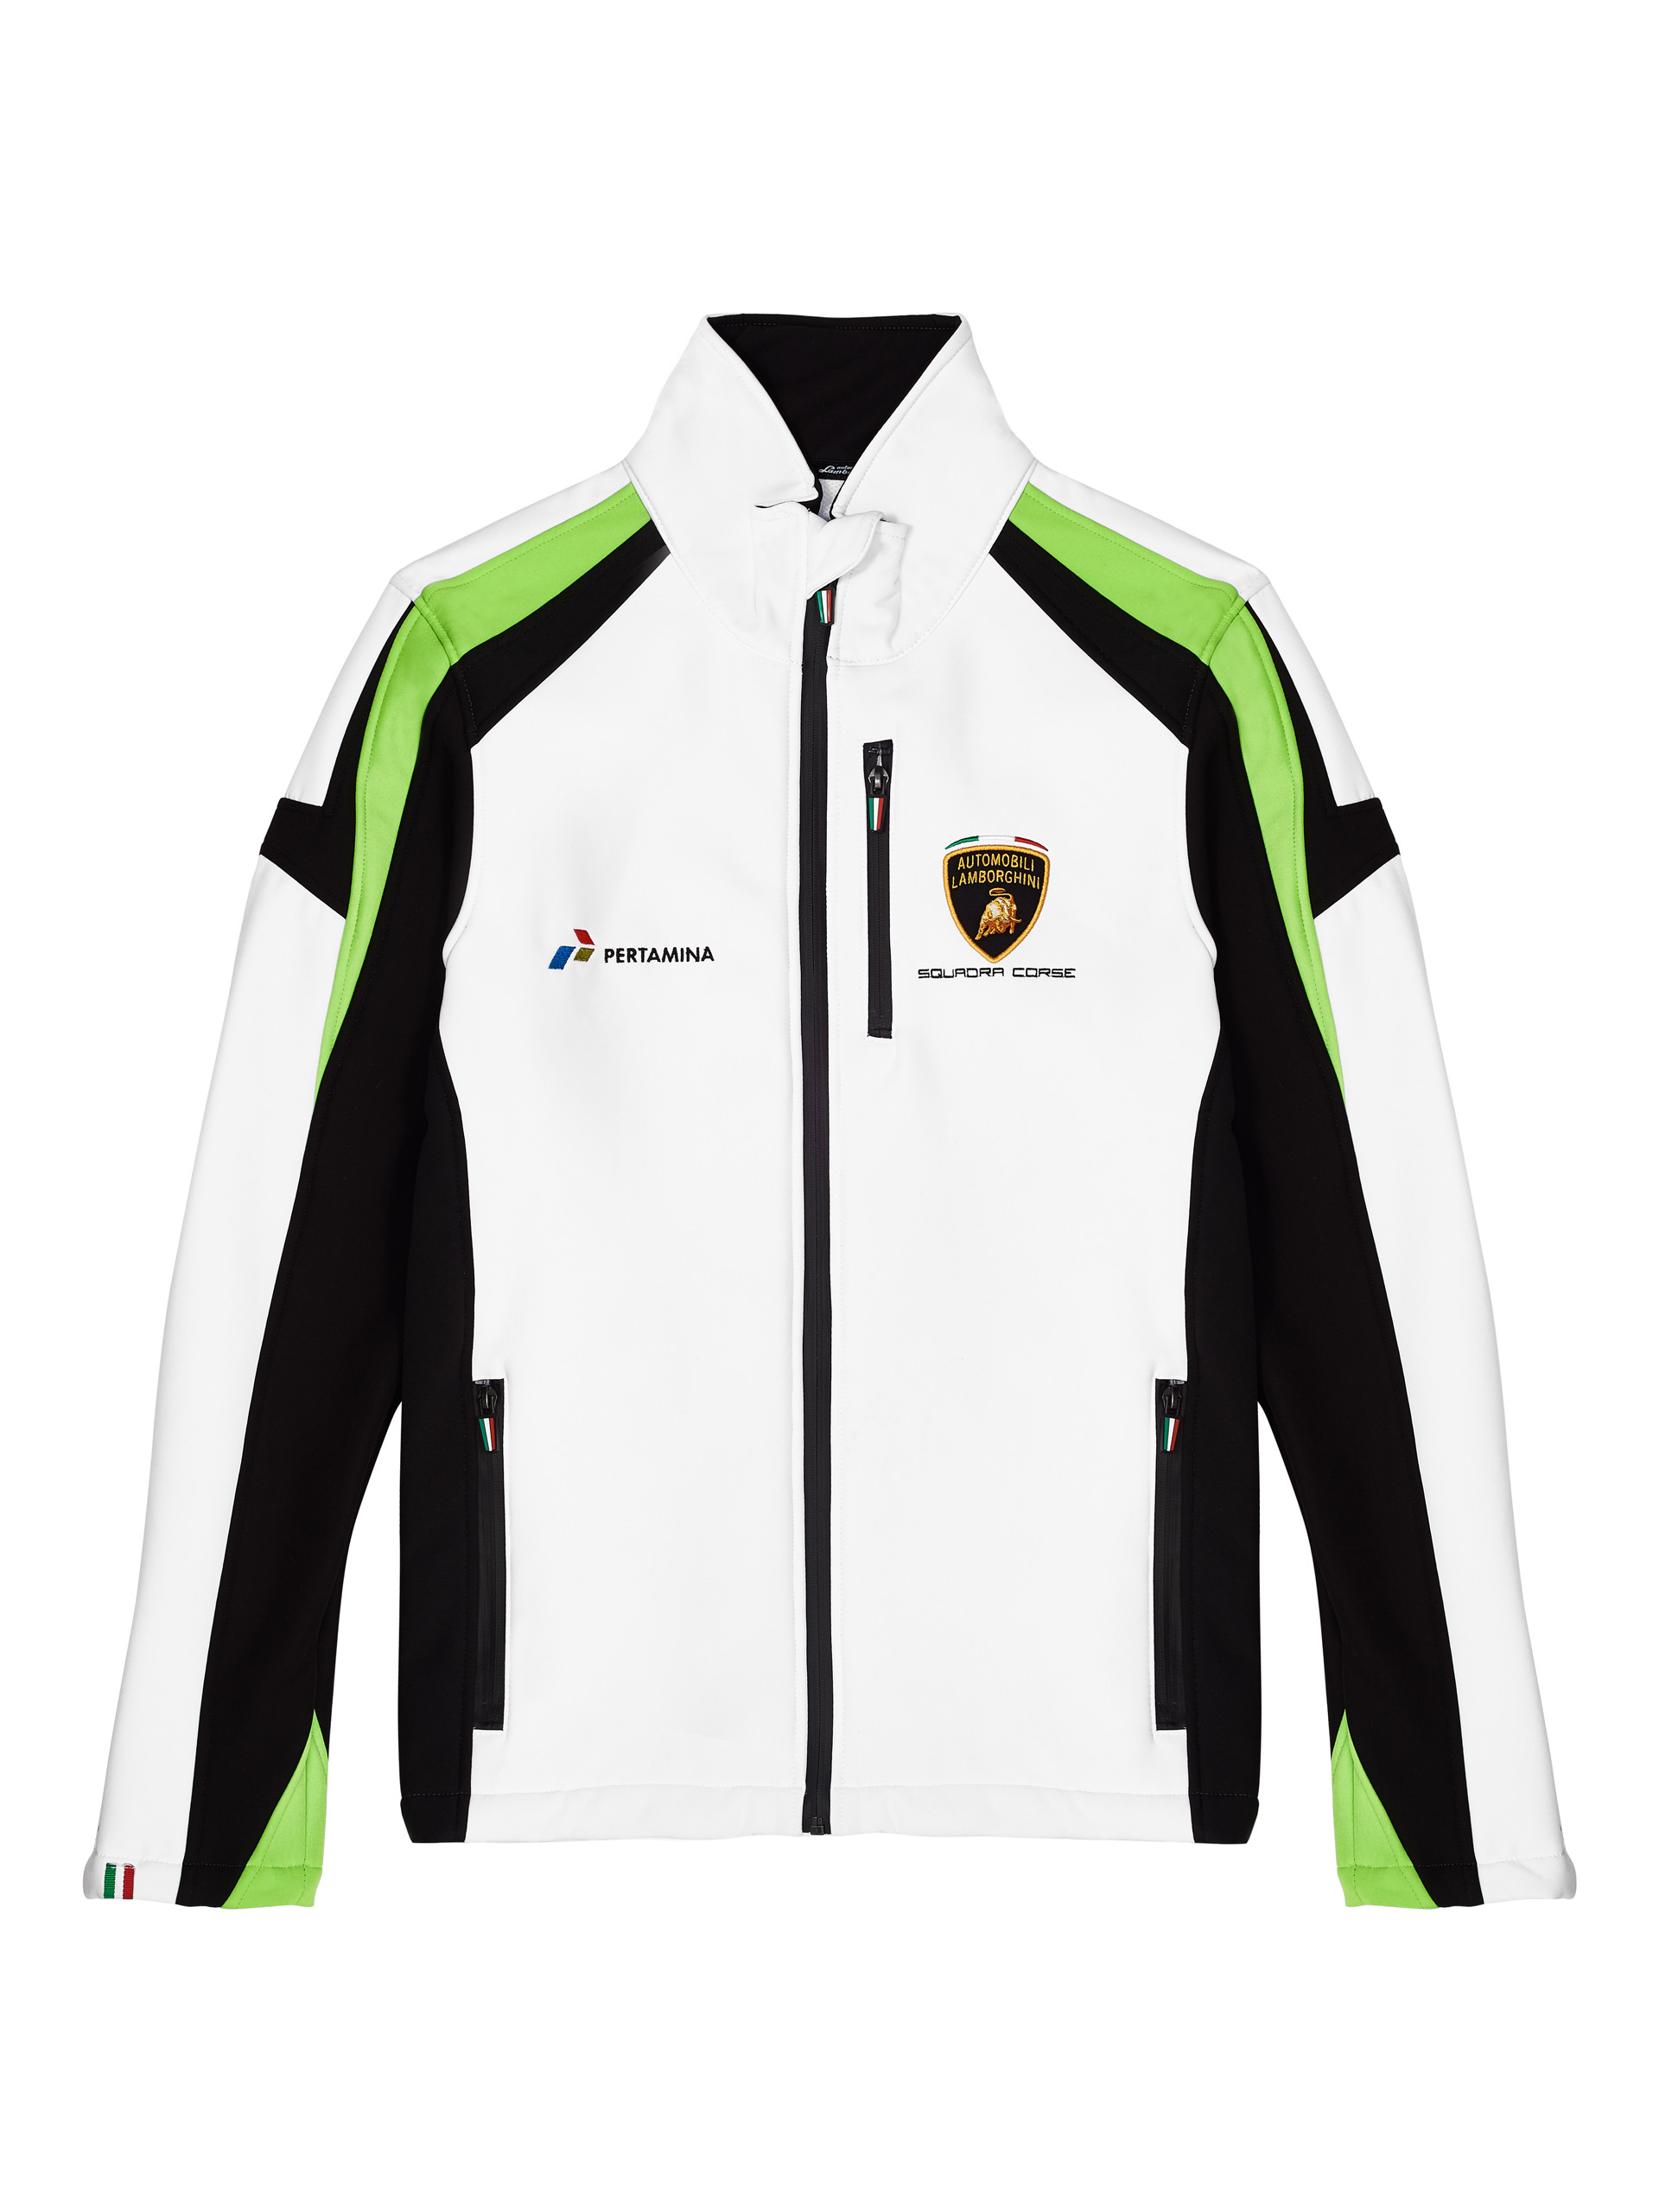 Lc281806 Lamborghini Squadra Corse Gt3 Team Men S Softshell Jacket